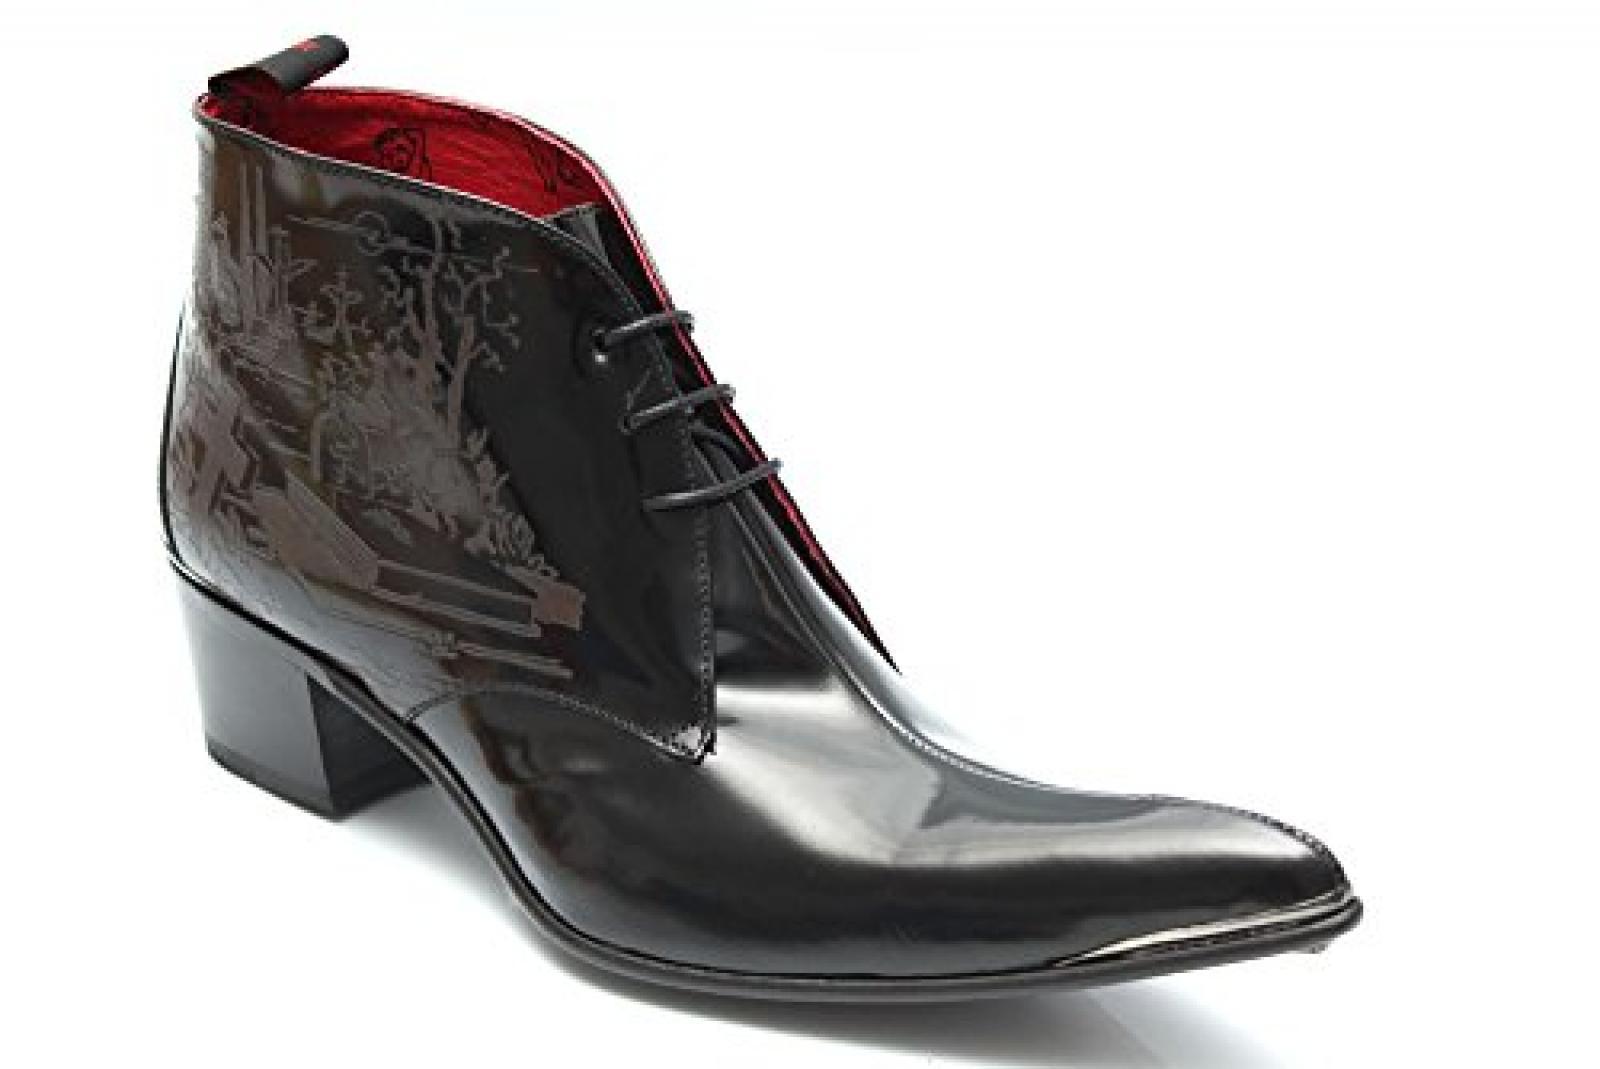 Jeffery West Muse Graveyard G0756Ap - Herren Ankle Boots - Kuba-Absatz